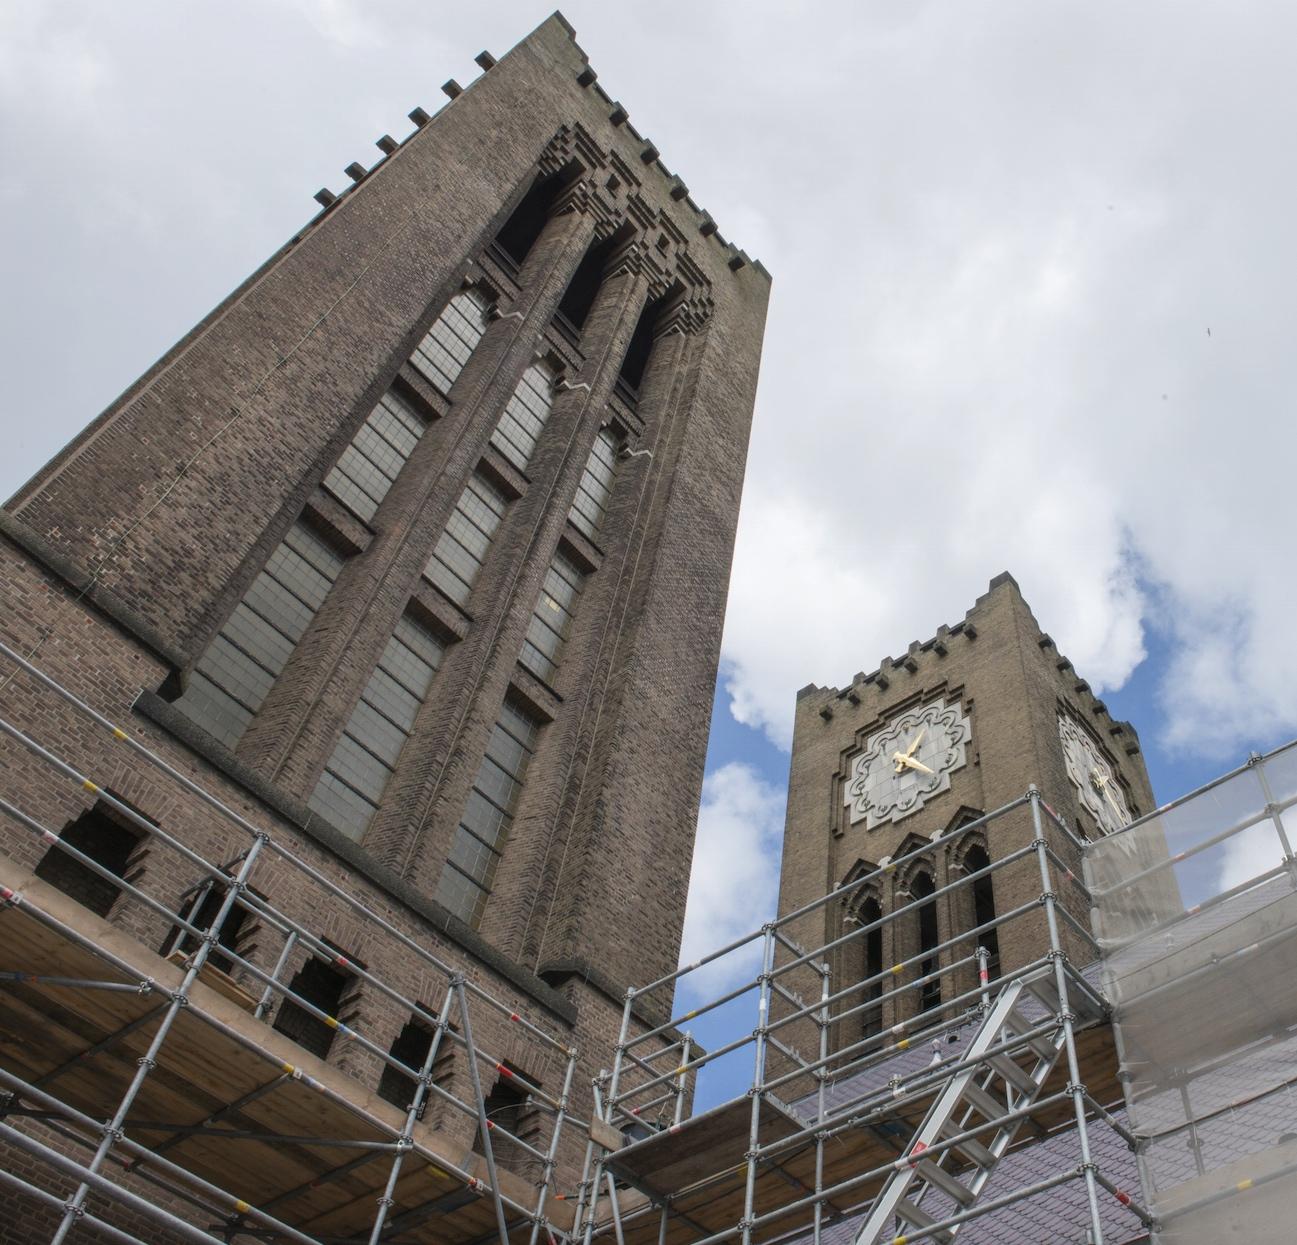 De westtorens van de nieuwe Bavo te Haarlem, van Joseph Th.J. en Pierre J.J.M. Cuypers (1925-1930).